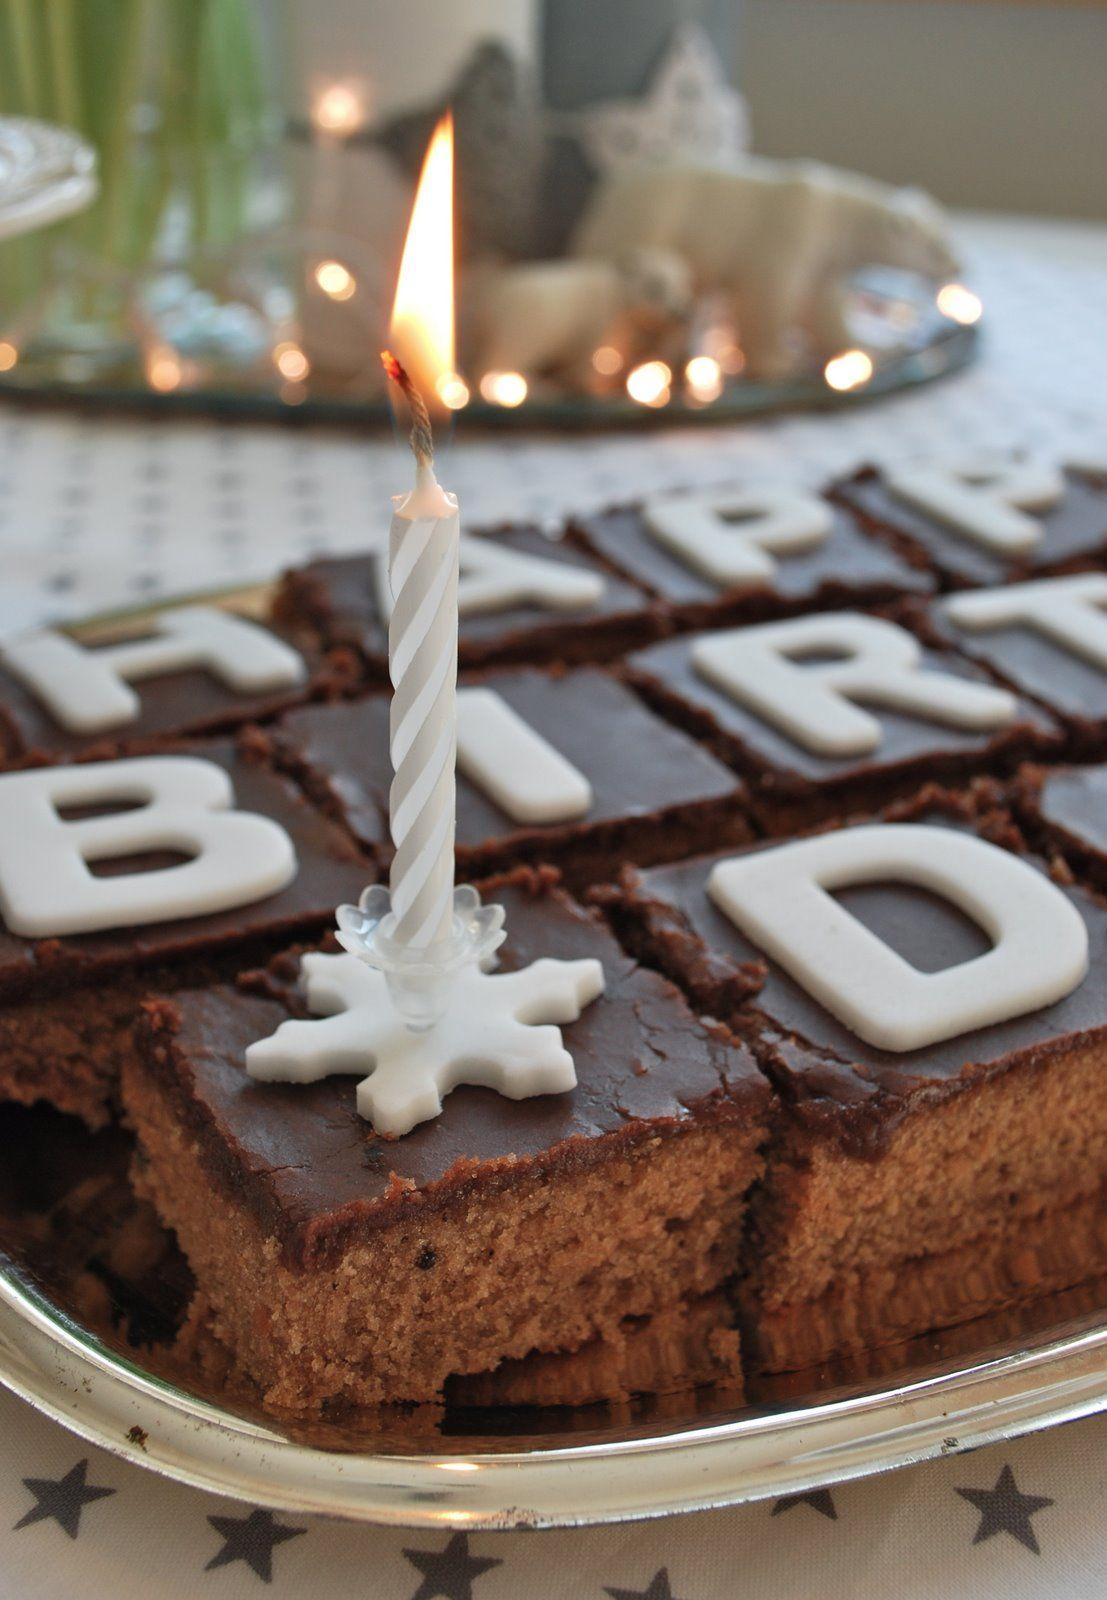 Dominik Geburtstagsfeier Brownie Birthday Cake Great idea cakes